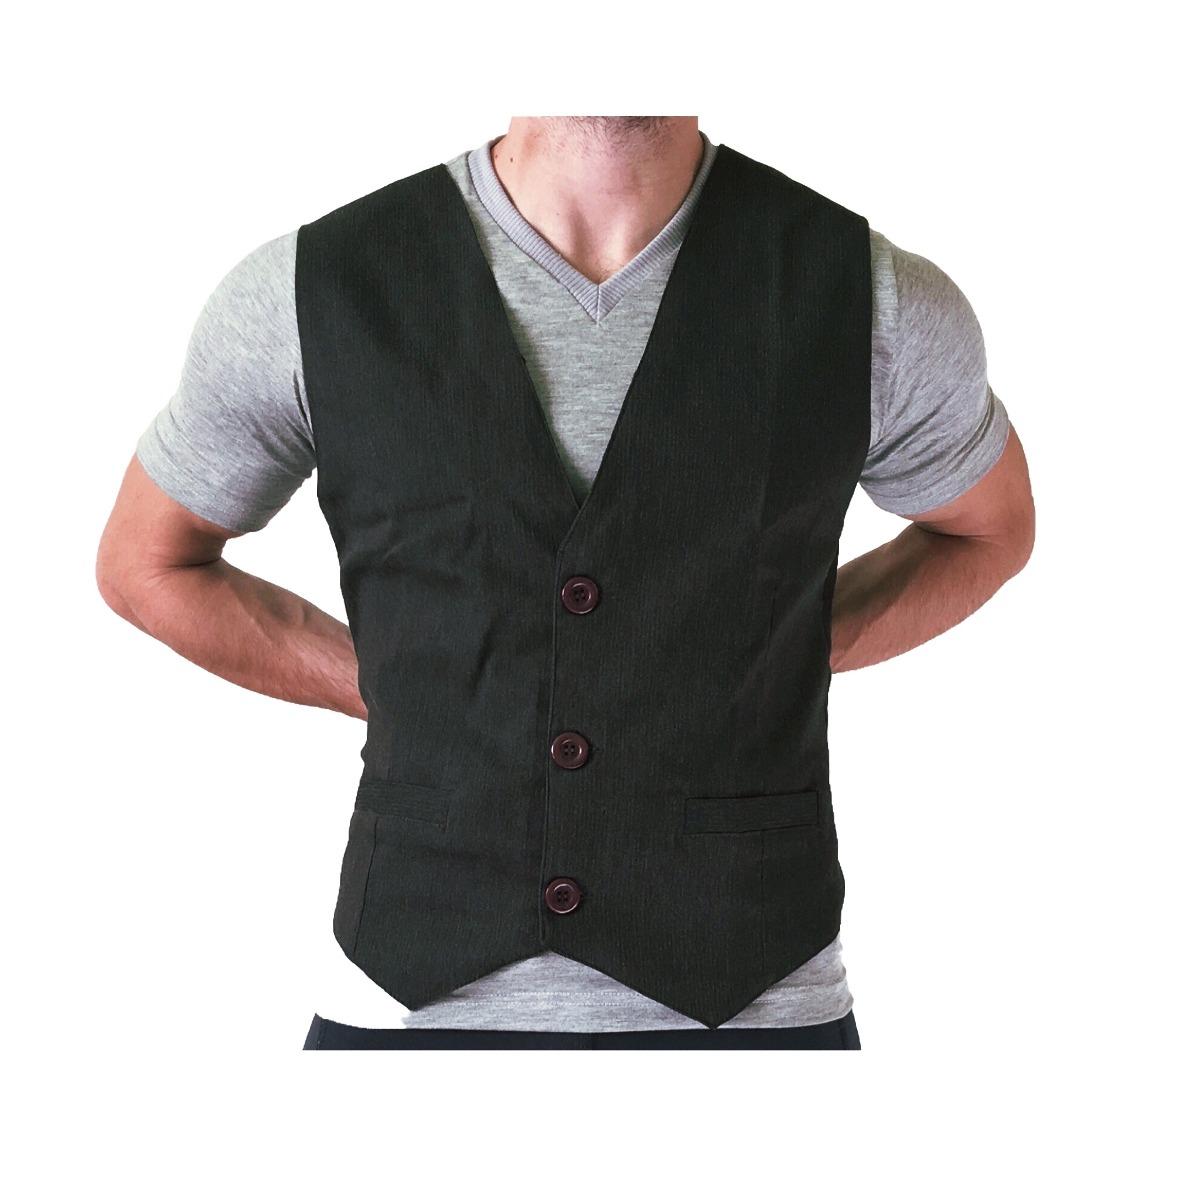 Chaleco De Vestir Para Hombre -   199.00 en Mercado Libre eaae7b89d12e